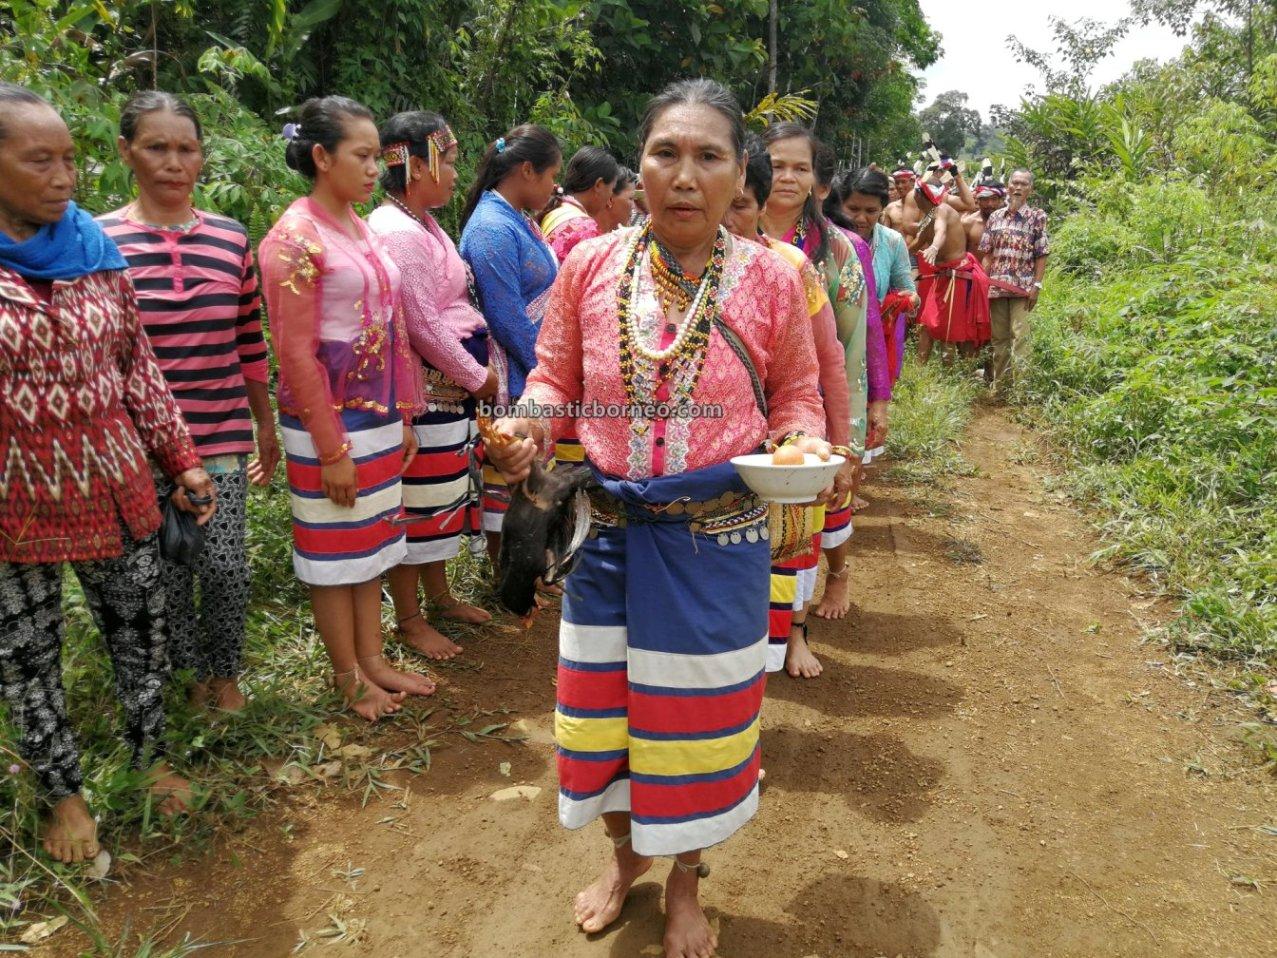 Nyobeng Rambai, Gawai Harvest Festival, authentic, village, backpackers, culture, West Kalimantan, Desa Sahan, Native, obyek wisata, Tourism, cross border, Borneo, 婆羅洲达雅传统文化, 印尼西加里曼丹, 孟加映比达友丰收节